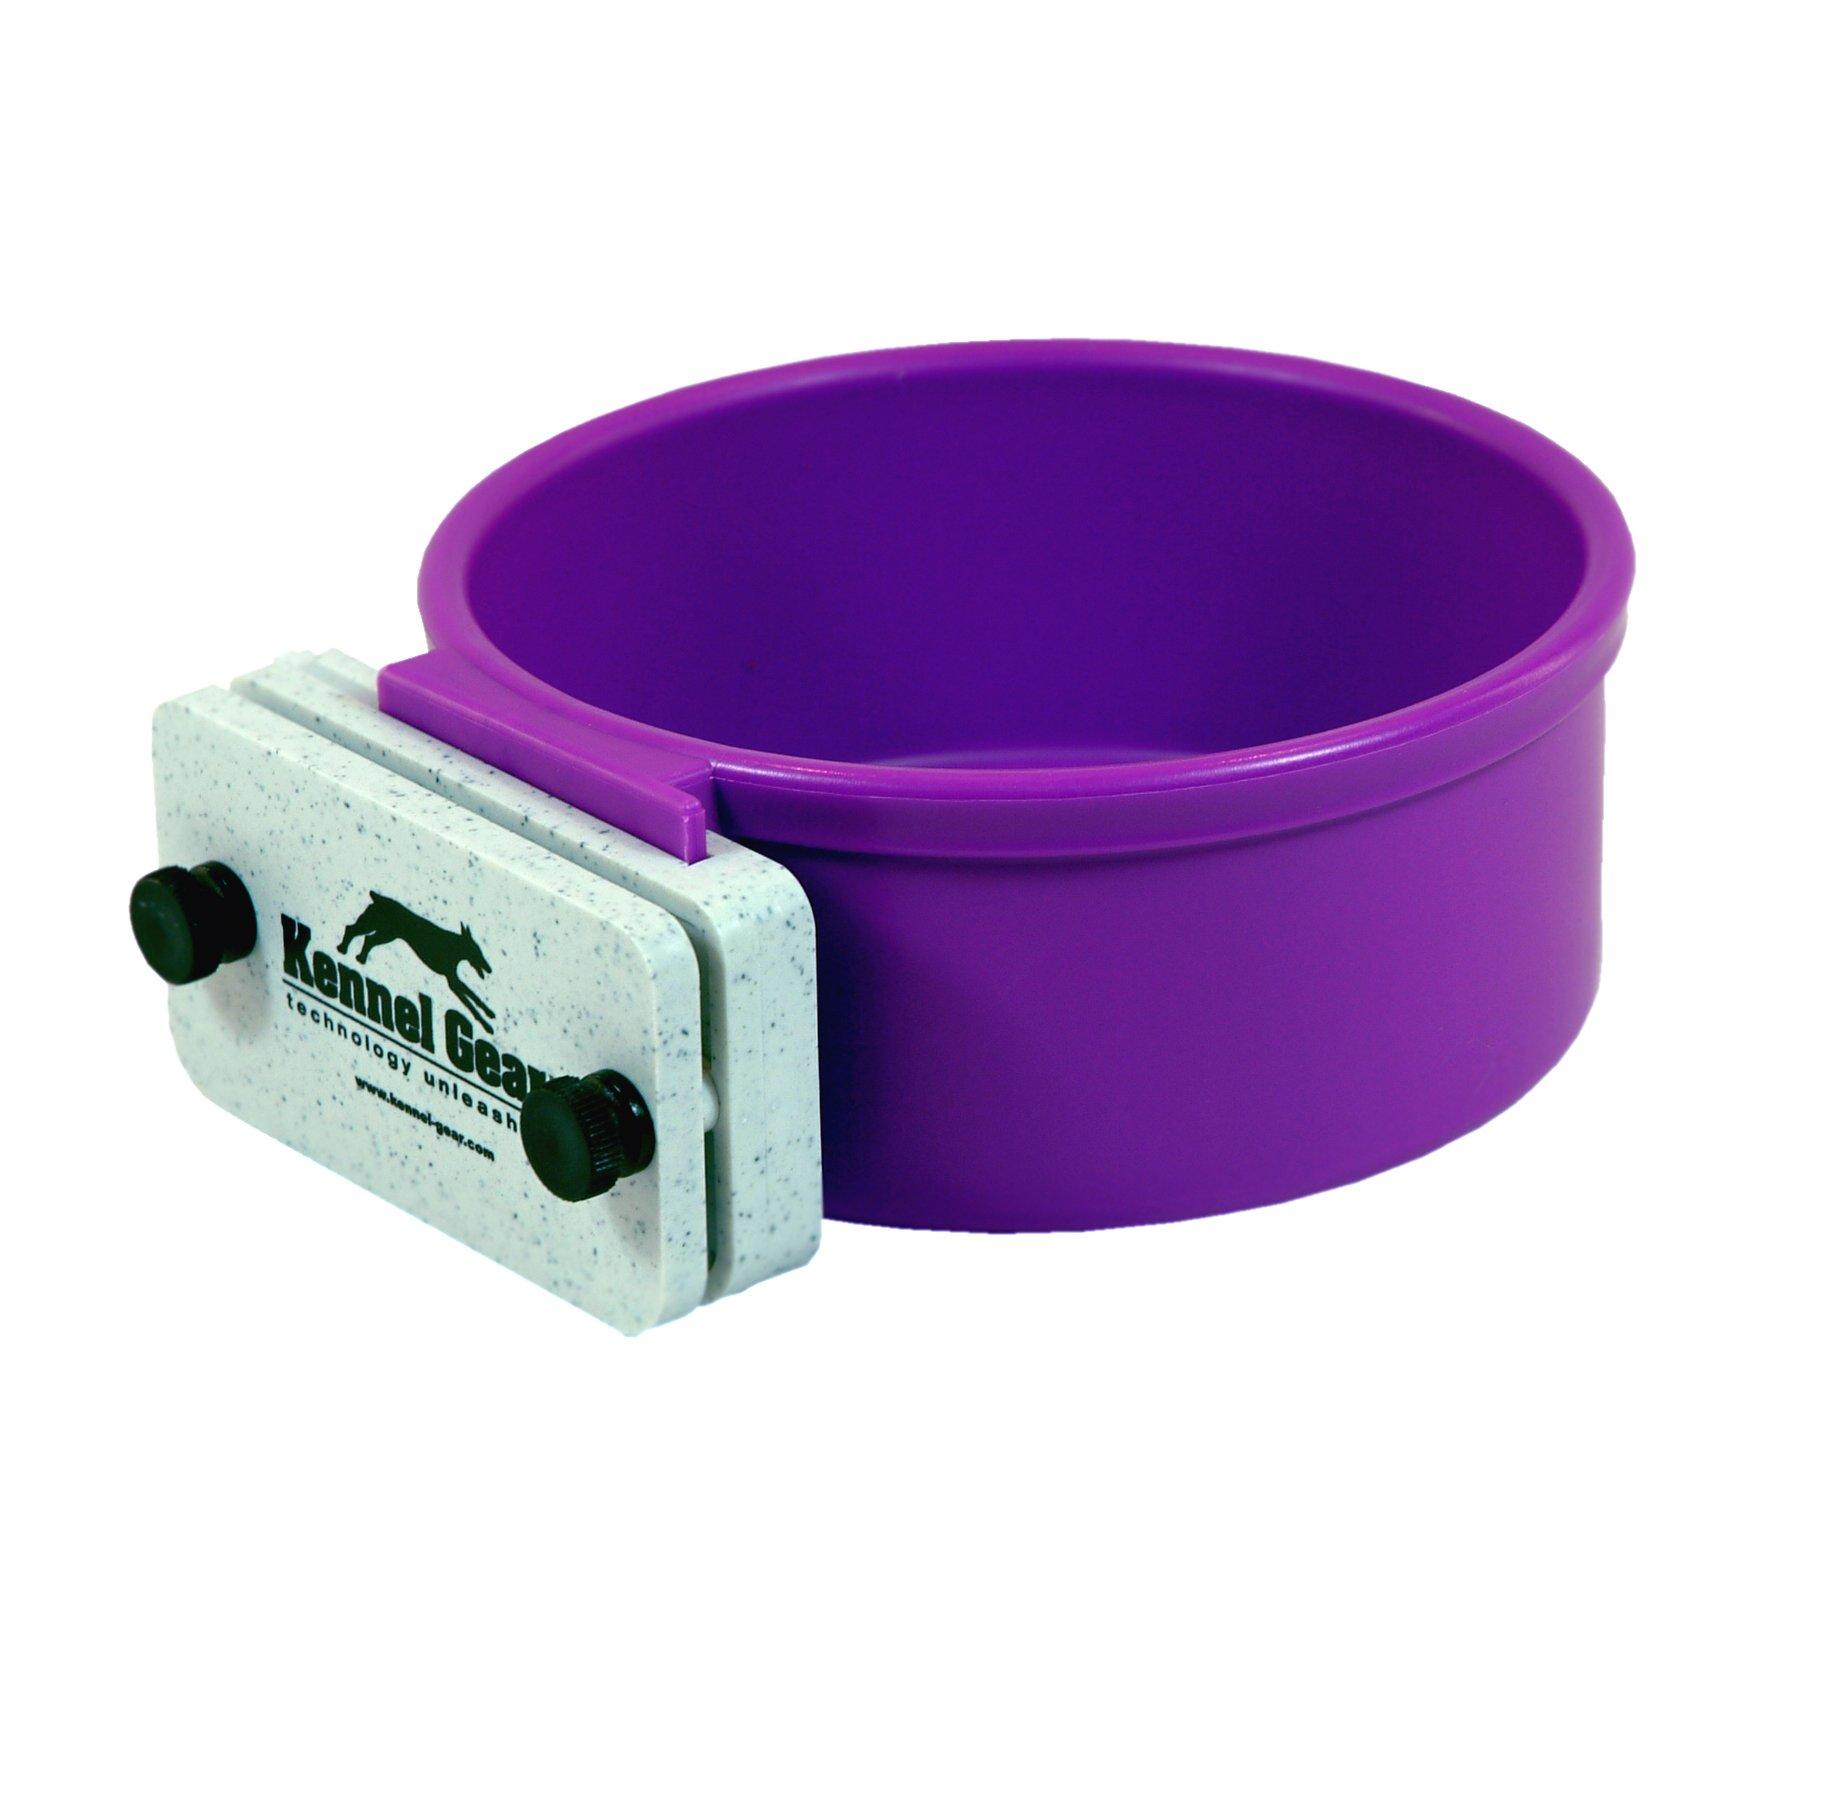 Kennel-Gear 20 oz Plastic Dog or Cat Bowl Kit, Purple by Kennel-Gear